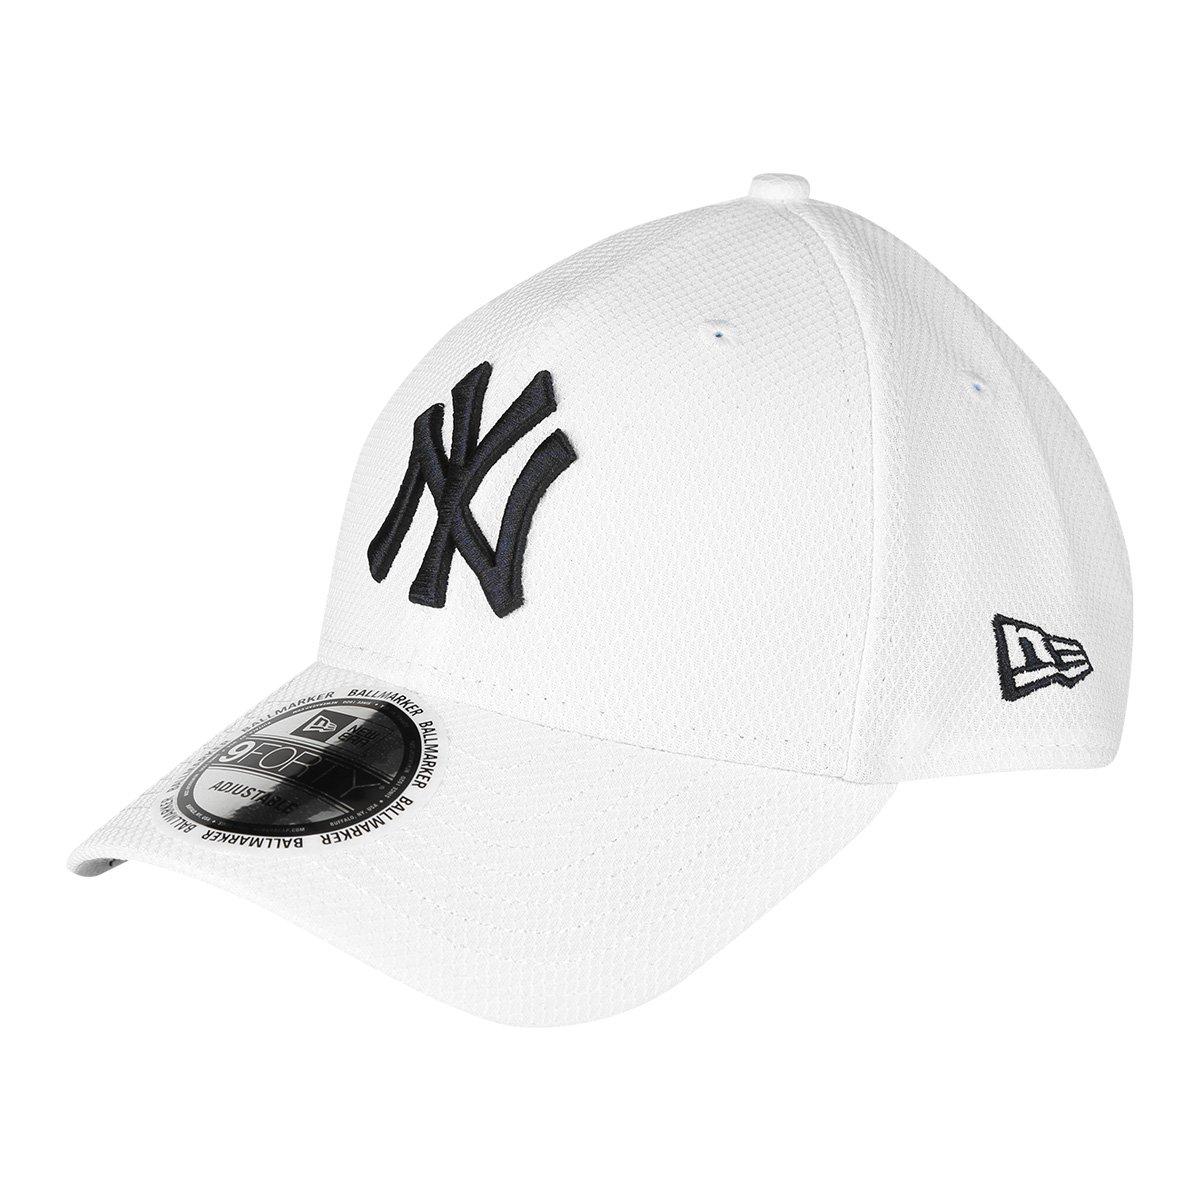 Boné New Era MBL New York Yankees Aba Curva 940 Fan Function - Compre Agora   11c038742d9